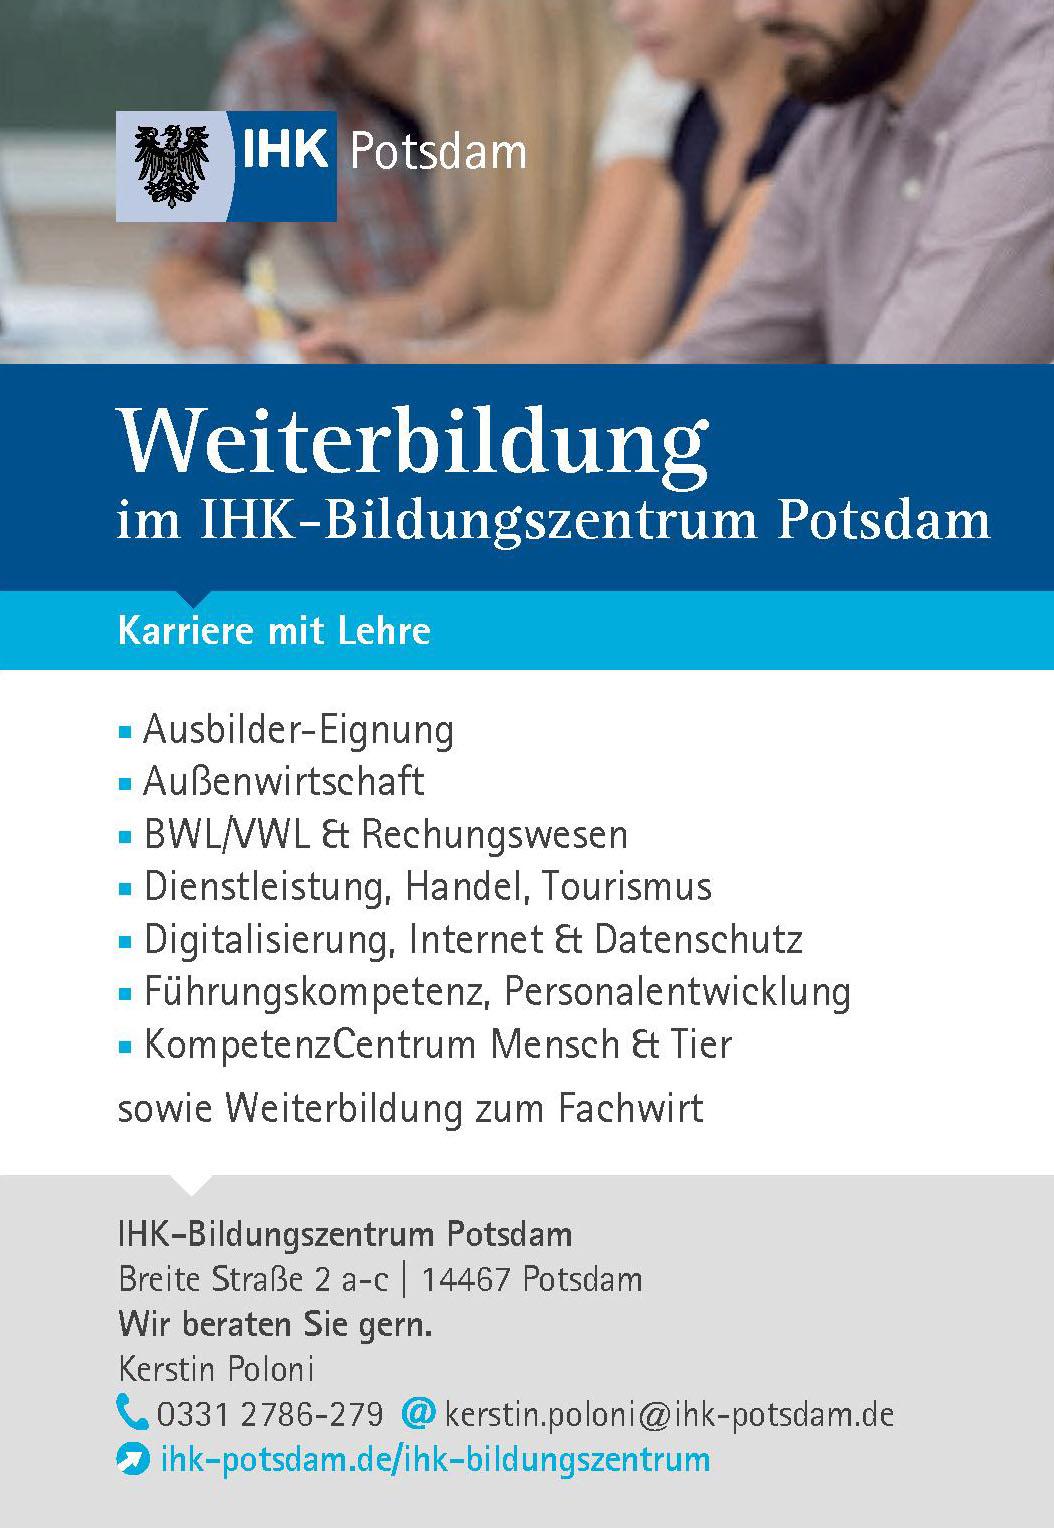 IHK-Bildungszentrum Potsdam